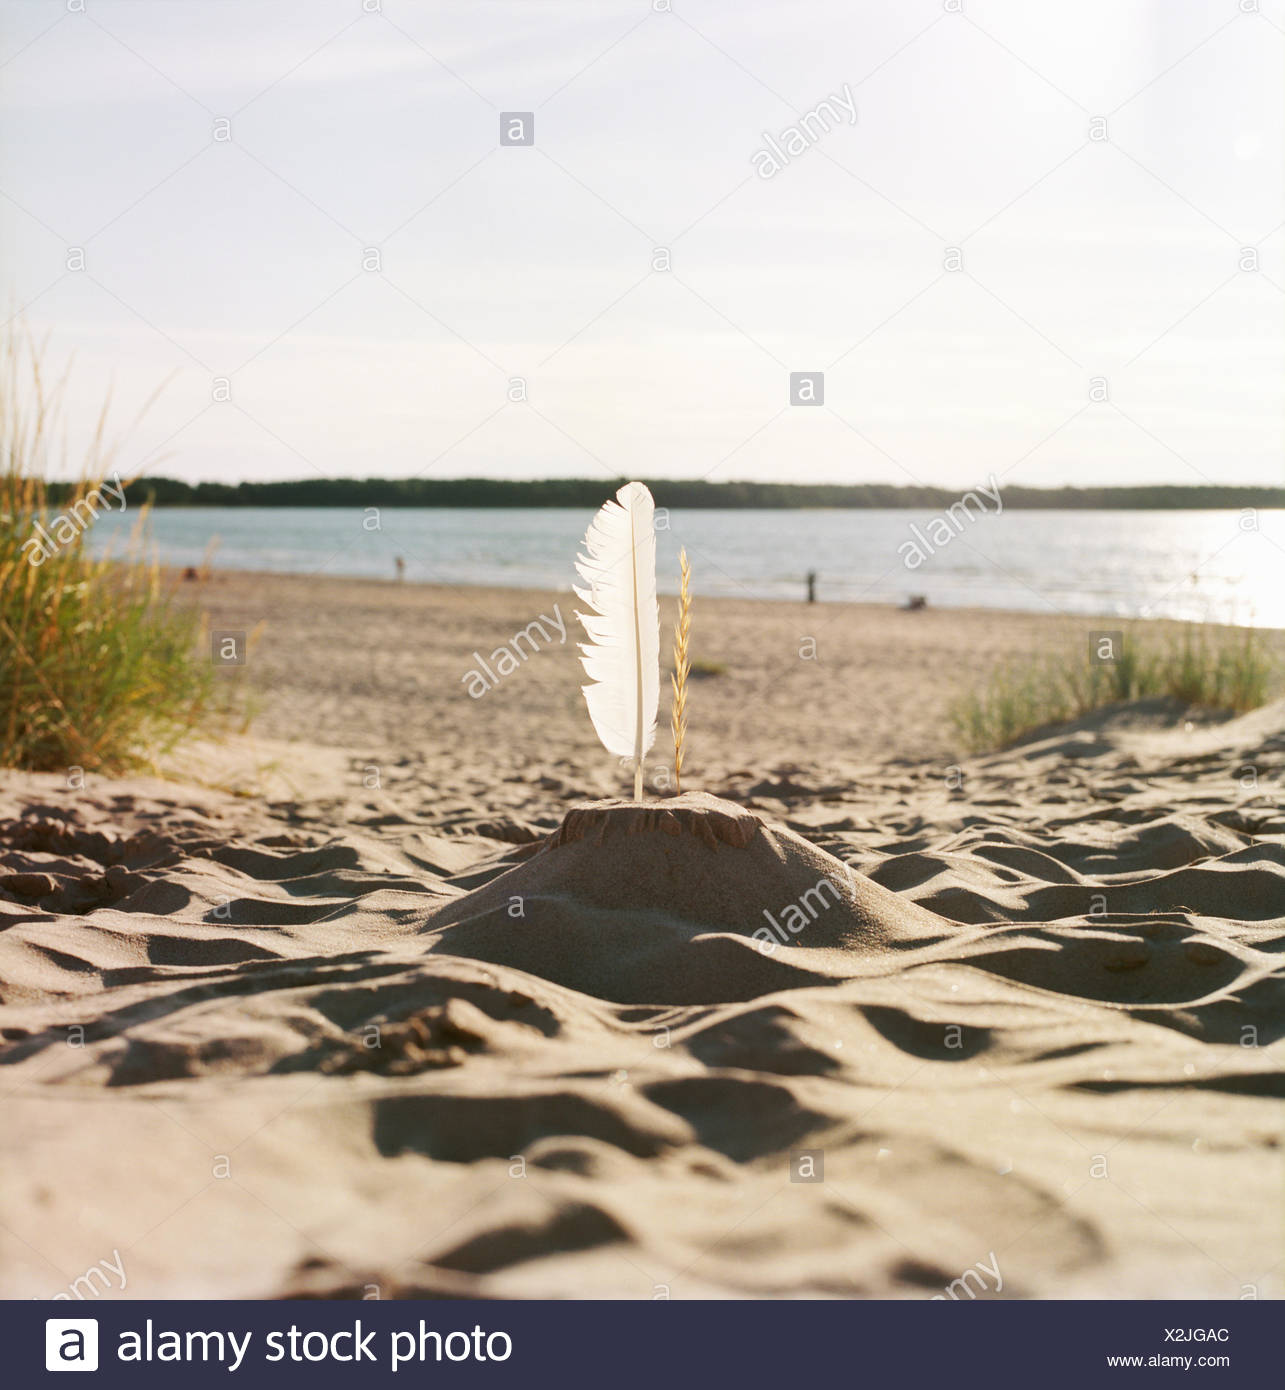 La Finlande, Pori, Blackpool, Sandcastle avec feather on sandy beach Photo Stock